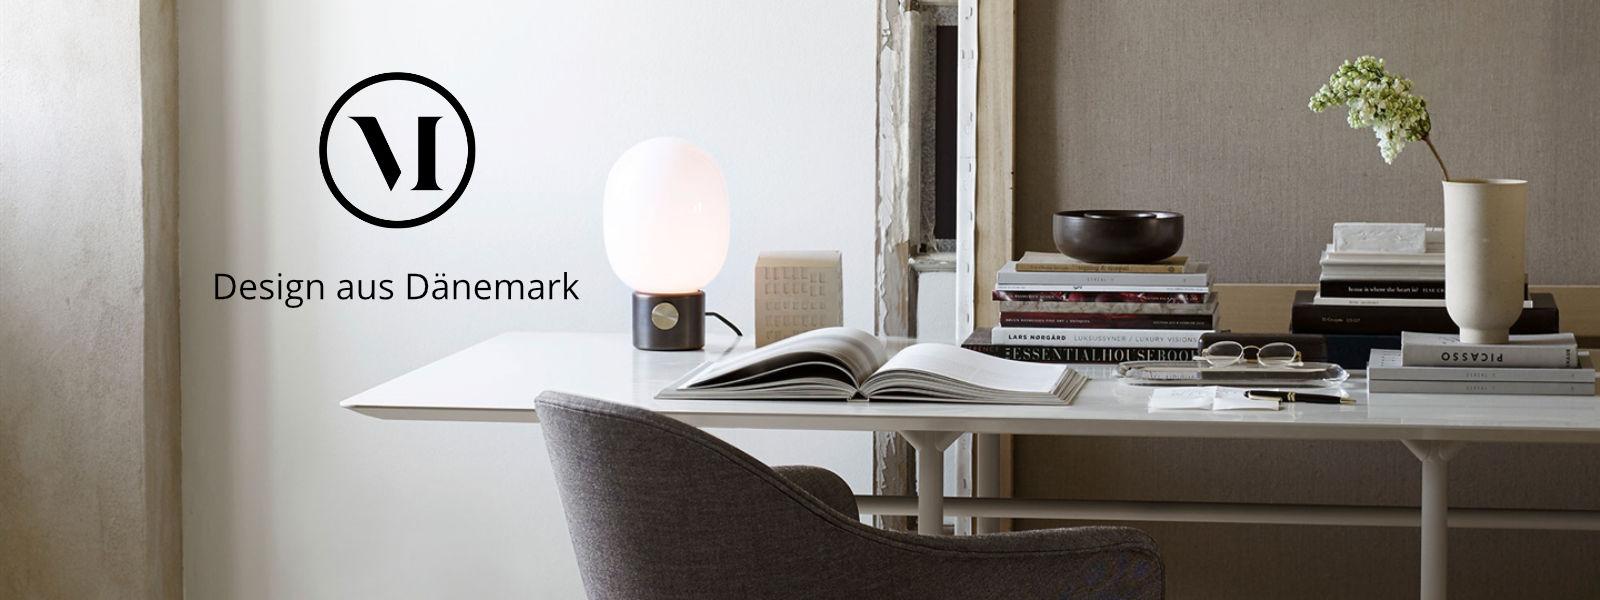 Menu: Design aus Dänemark